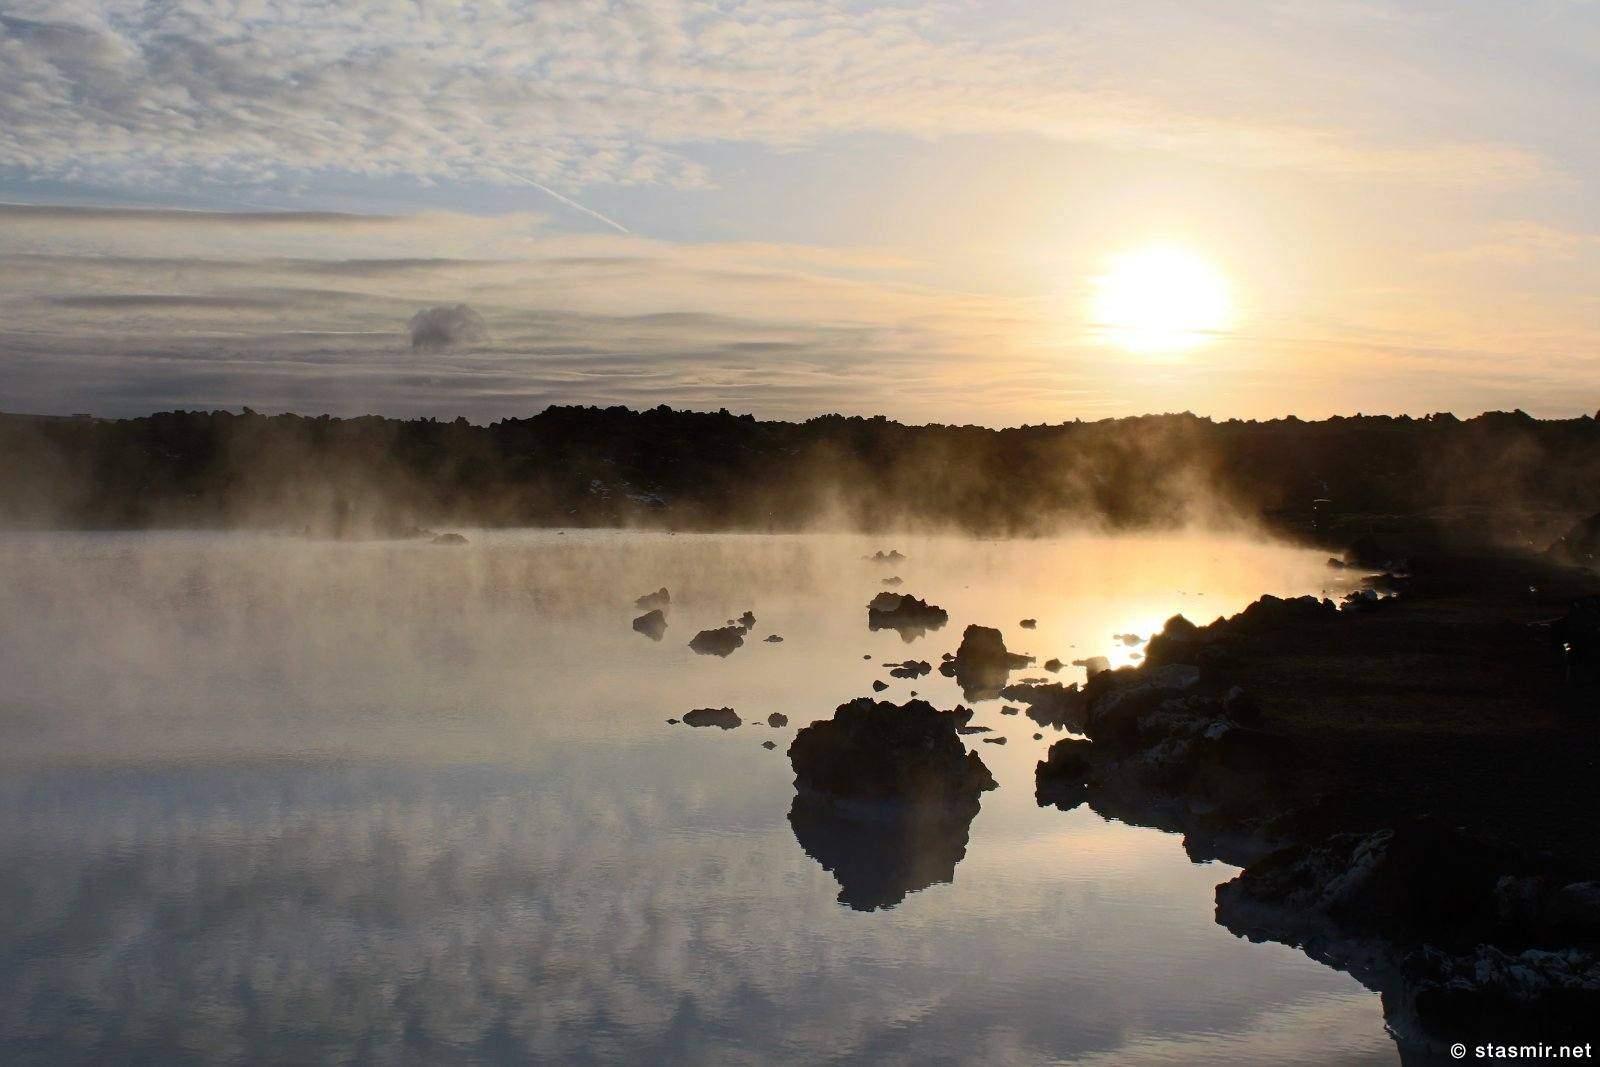 Bláa Lónið, Blue Lagoon, Голубая лагуна, фото Стасмир, photo Stasmir